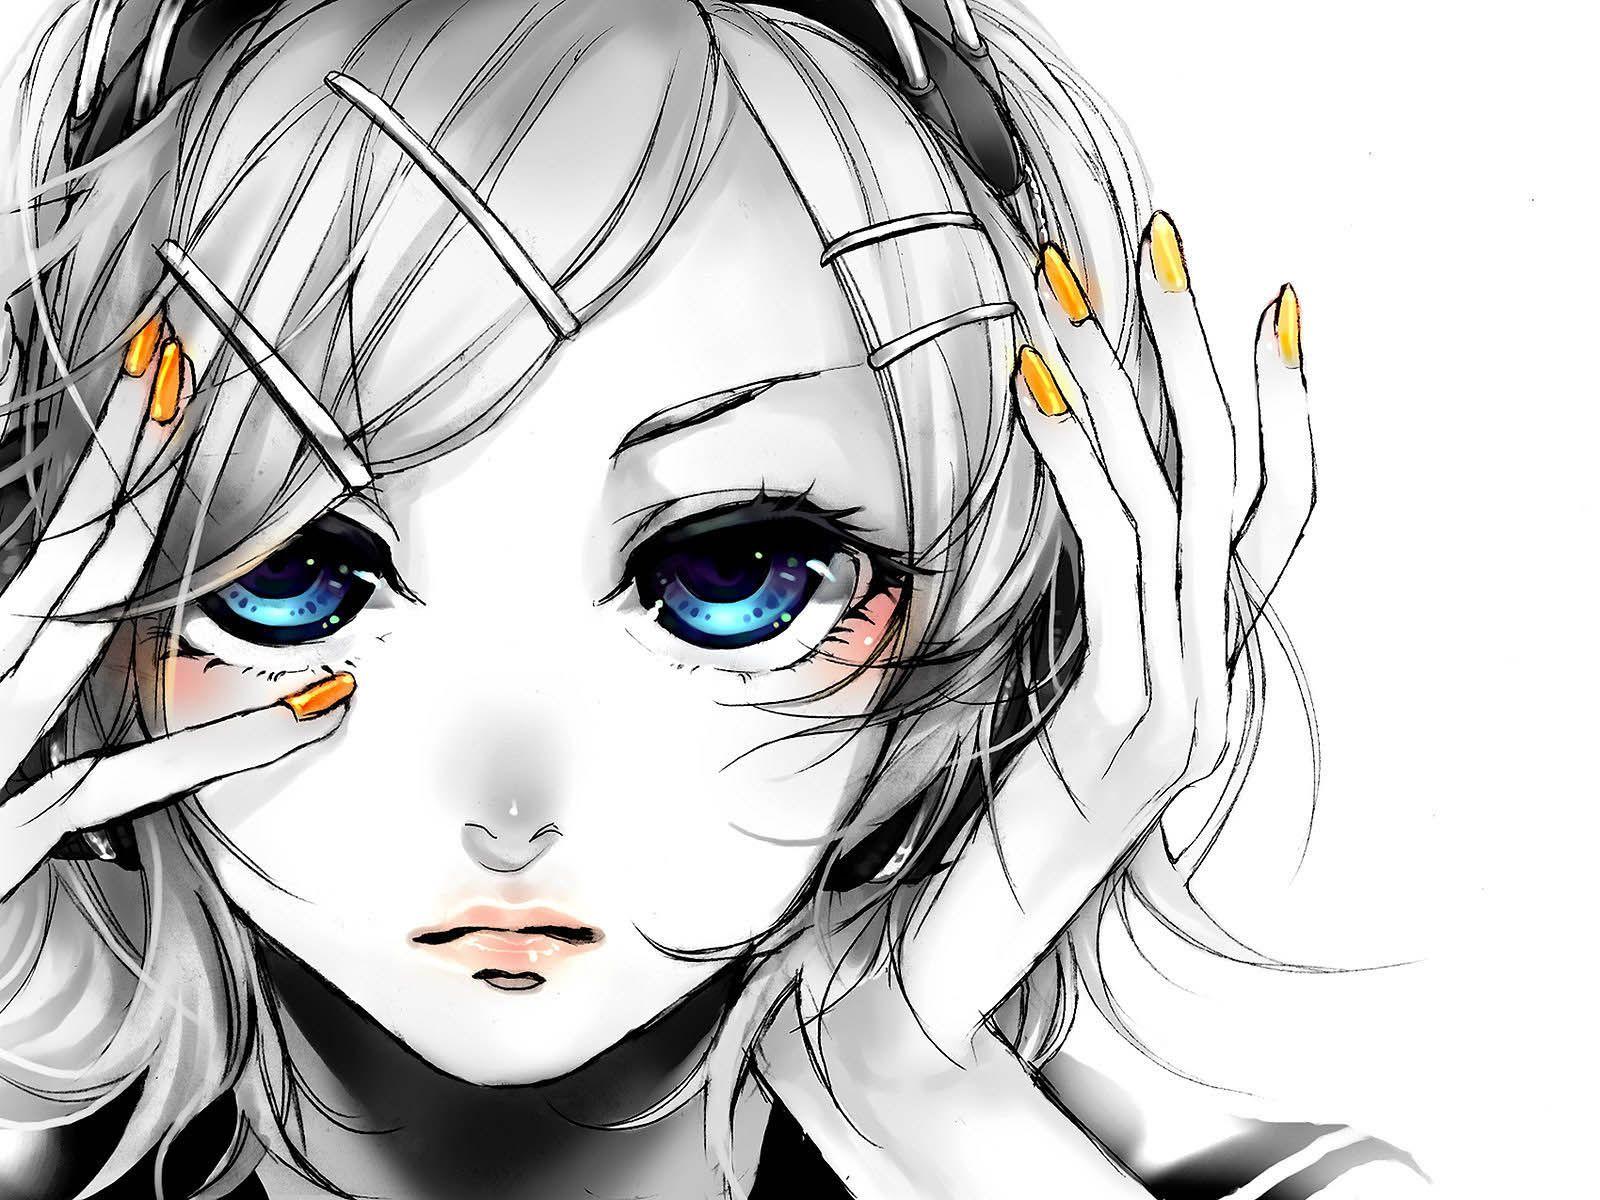 anime Tag Anime Girl Wallpapers, Backgrounds, Photos